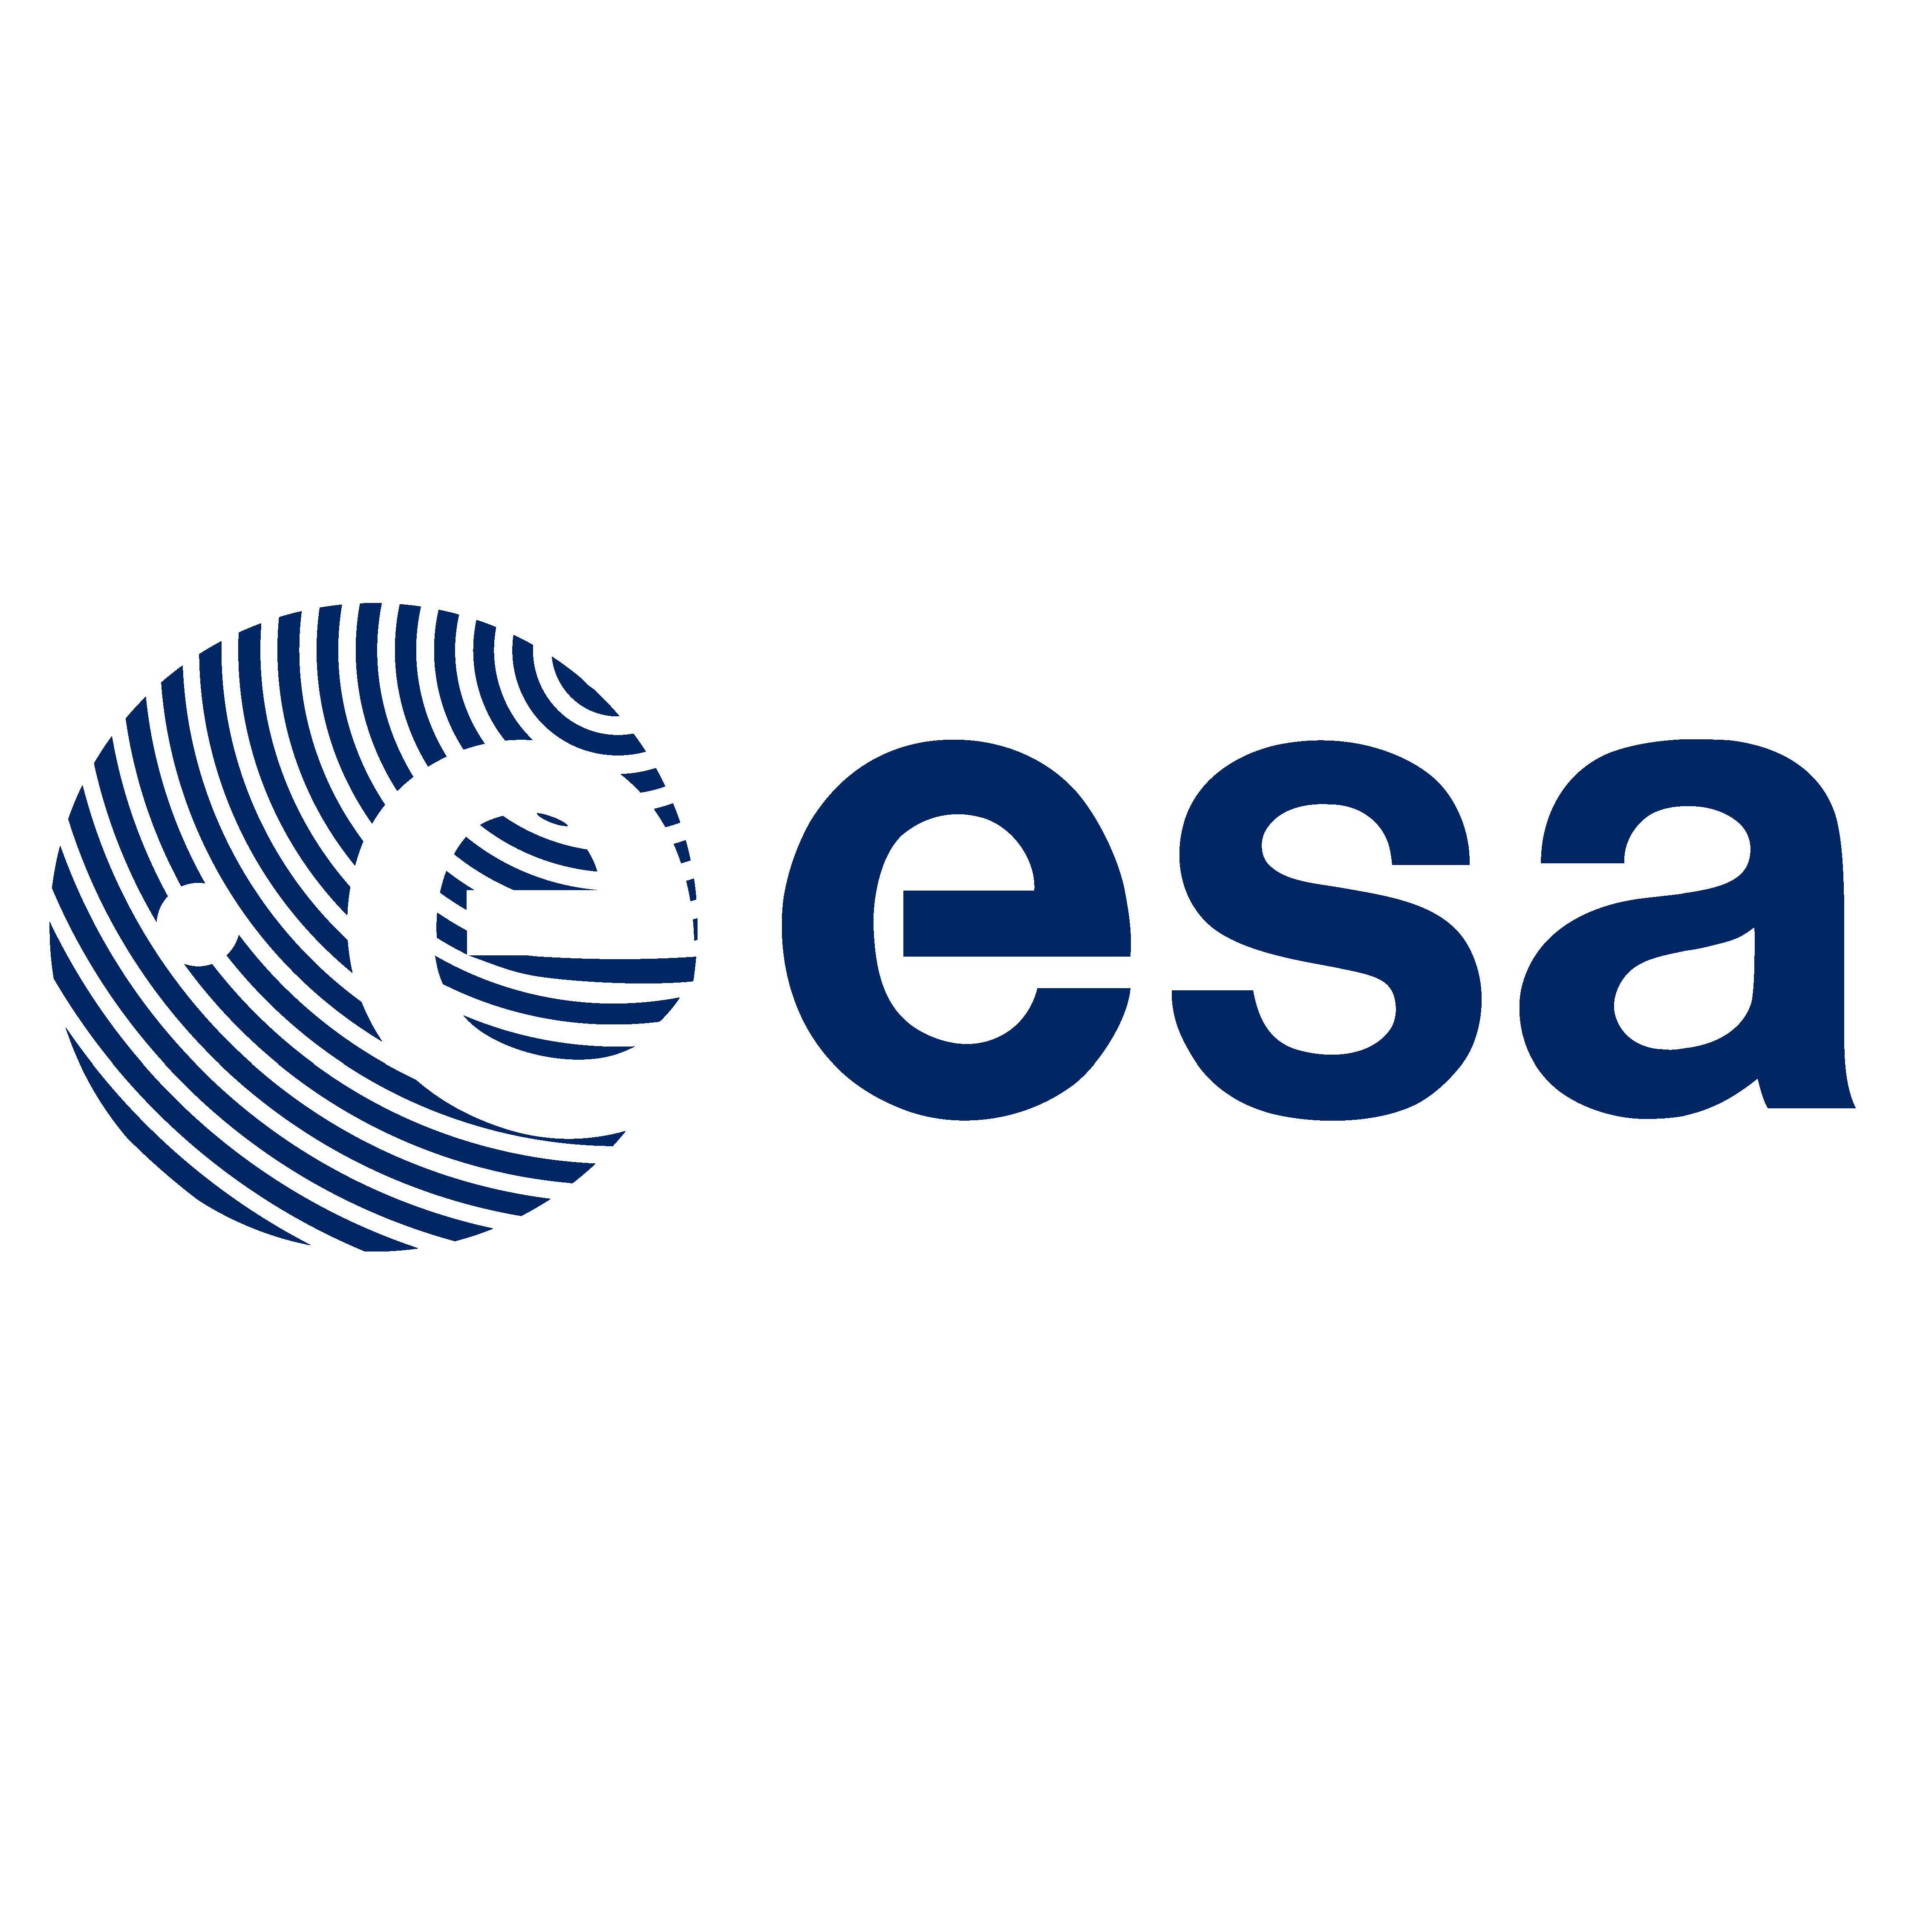 esa_logo_square